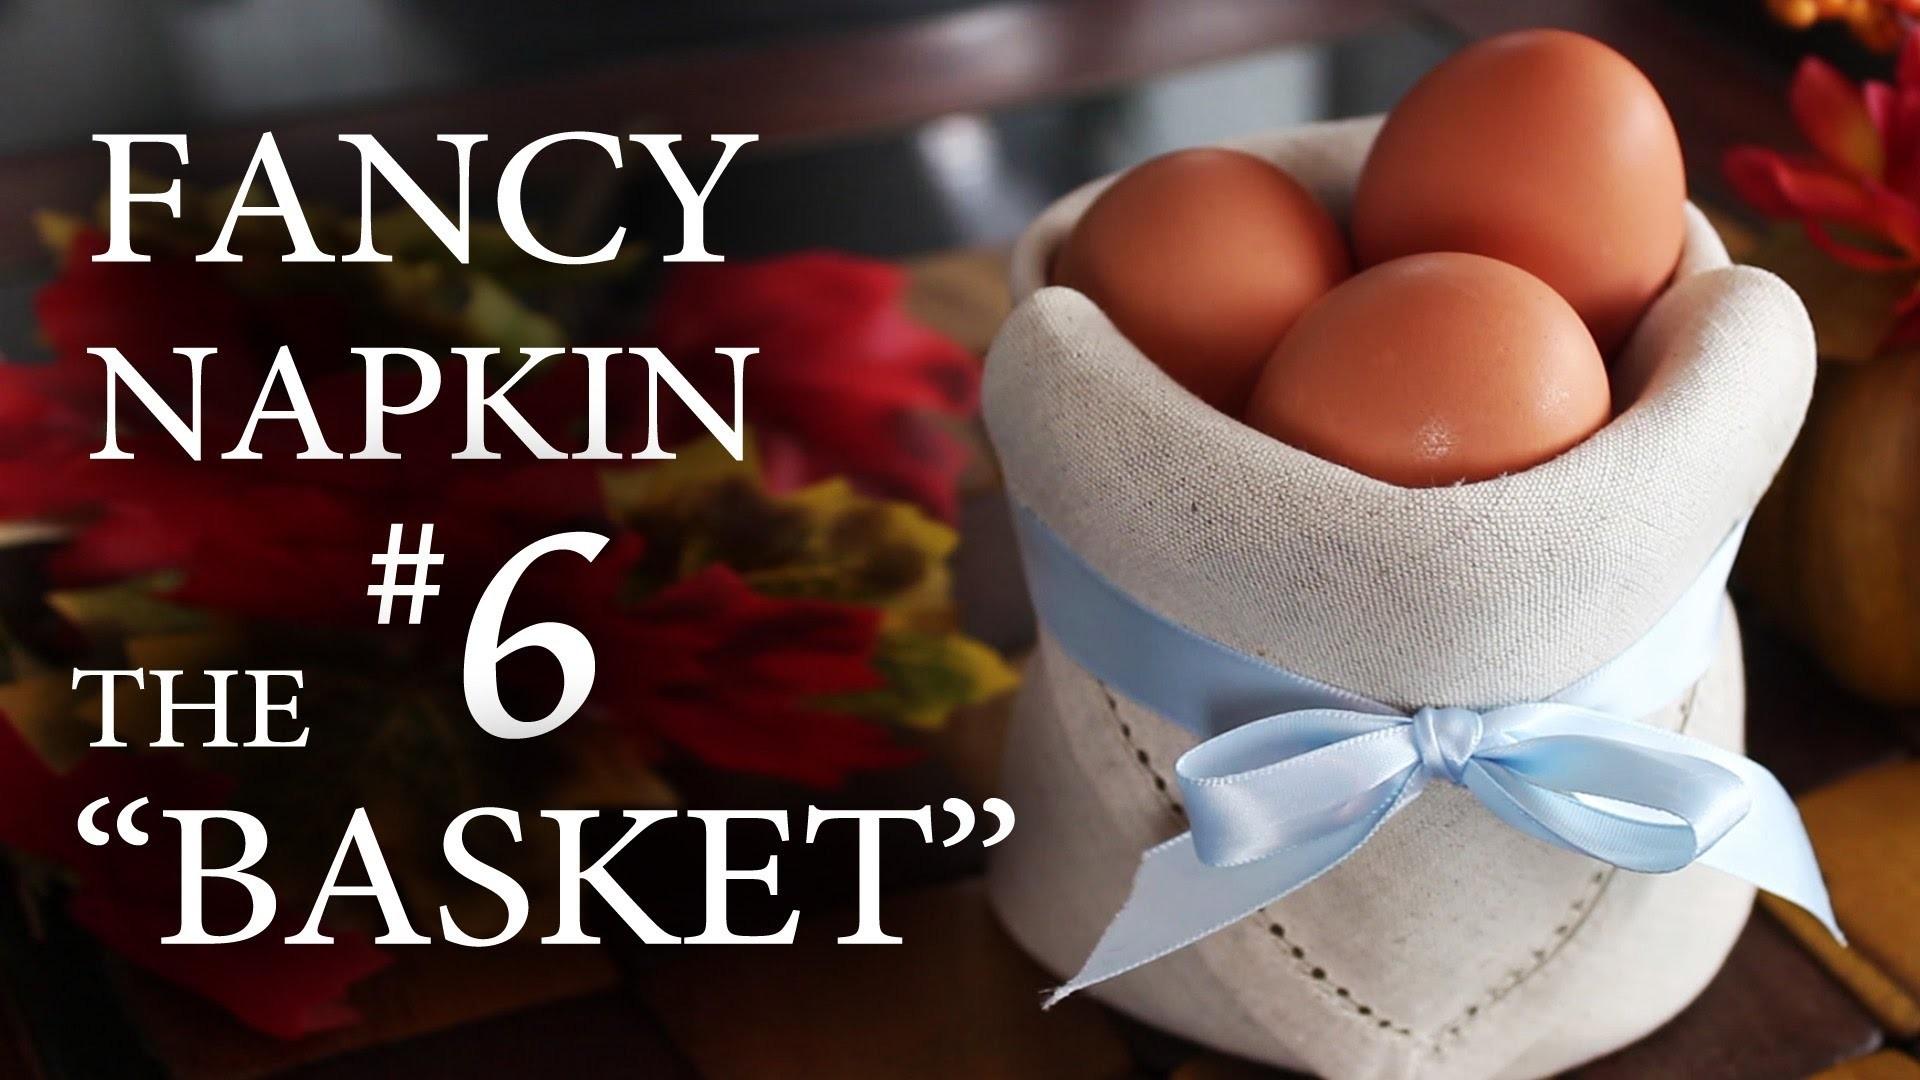 Fancy Napkin #6 - The